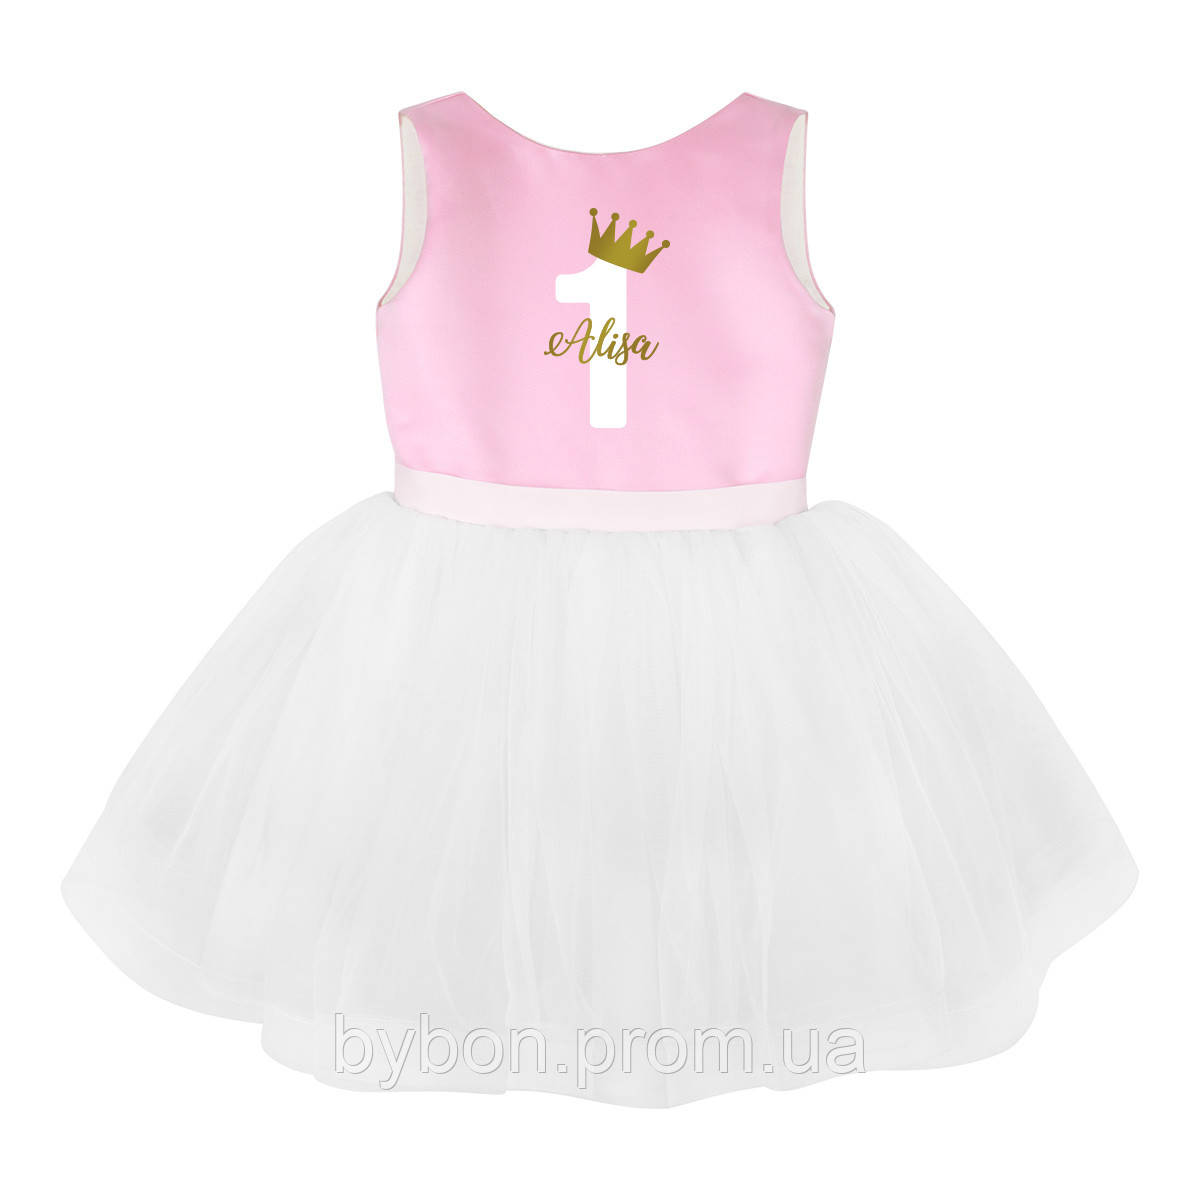 Платье Алессия Crown birthday